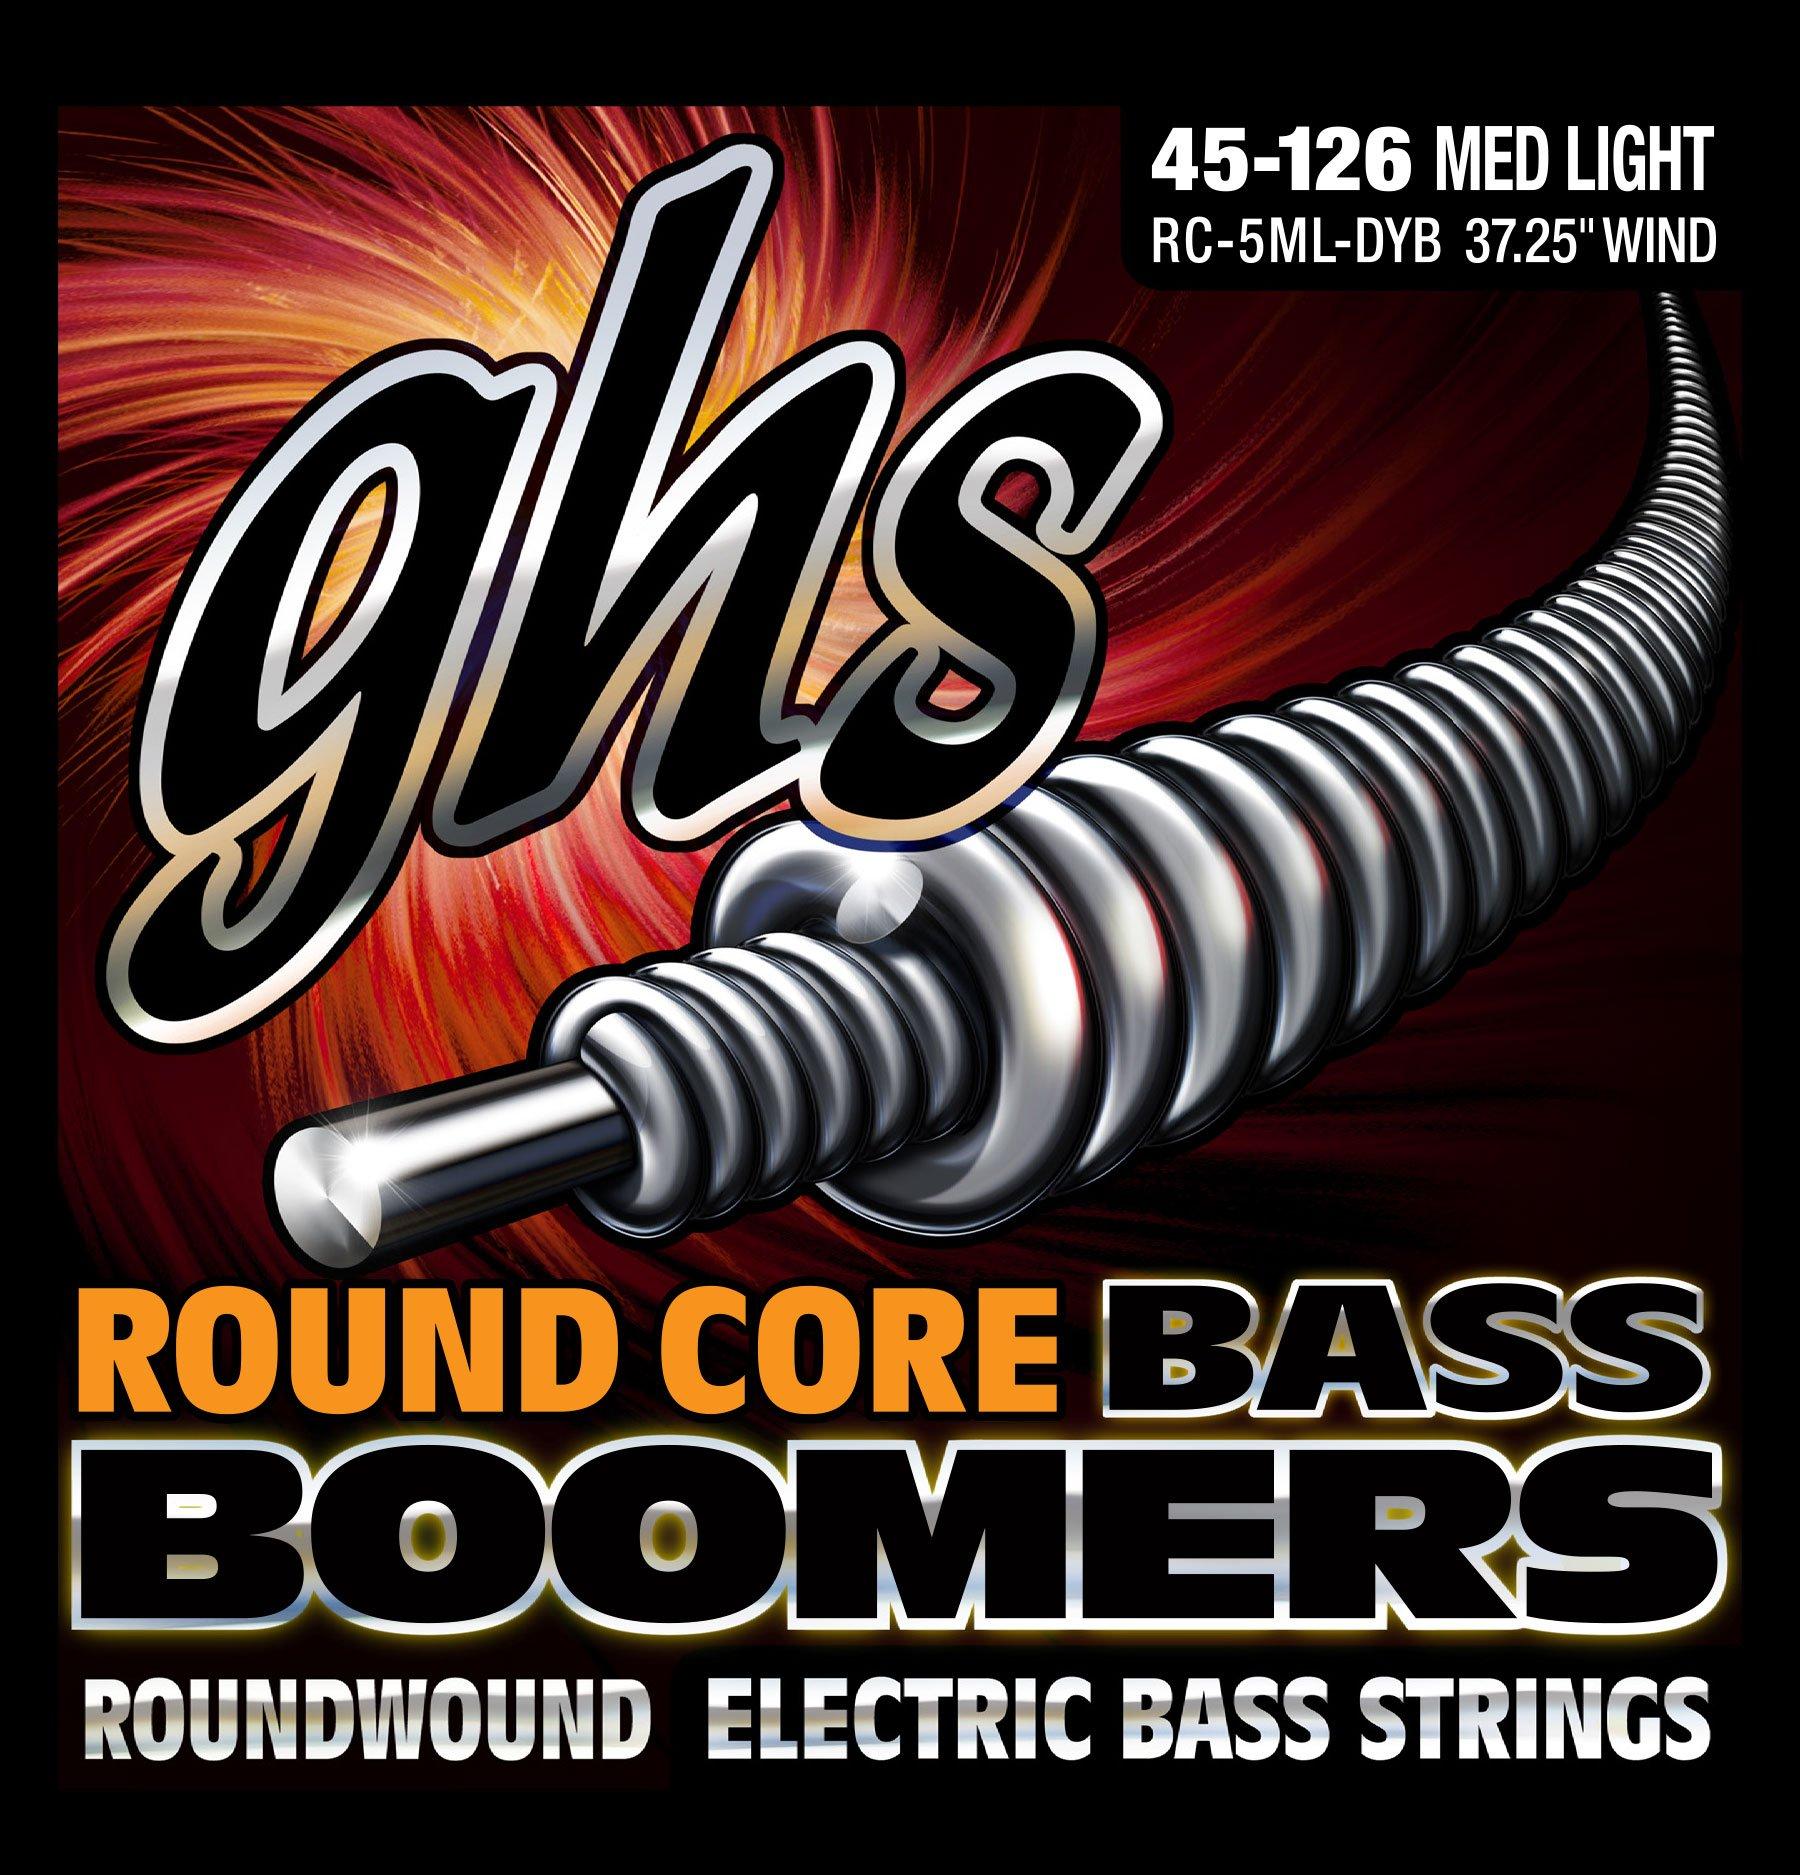 GHS Strings RC-5ML-DYB Round Core Bass Boomers, 5-Set, Medium Light Gauge (37.25'' winding)